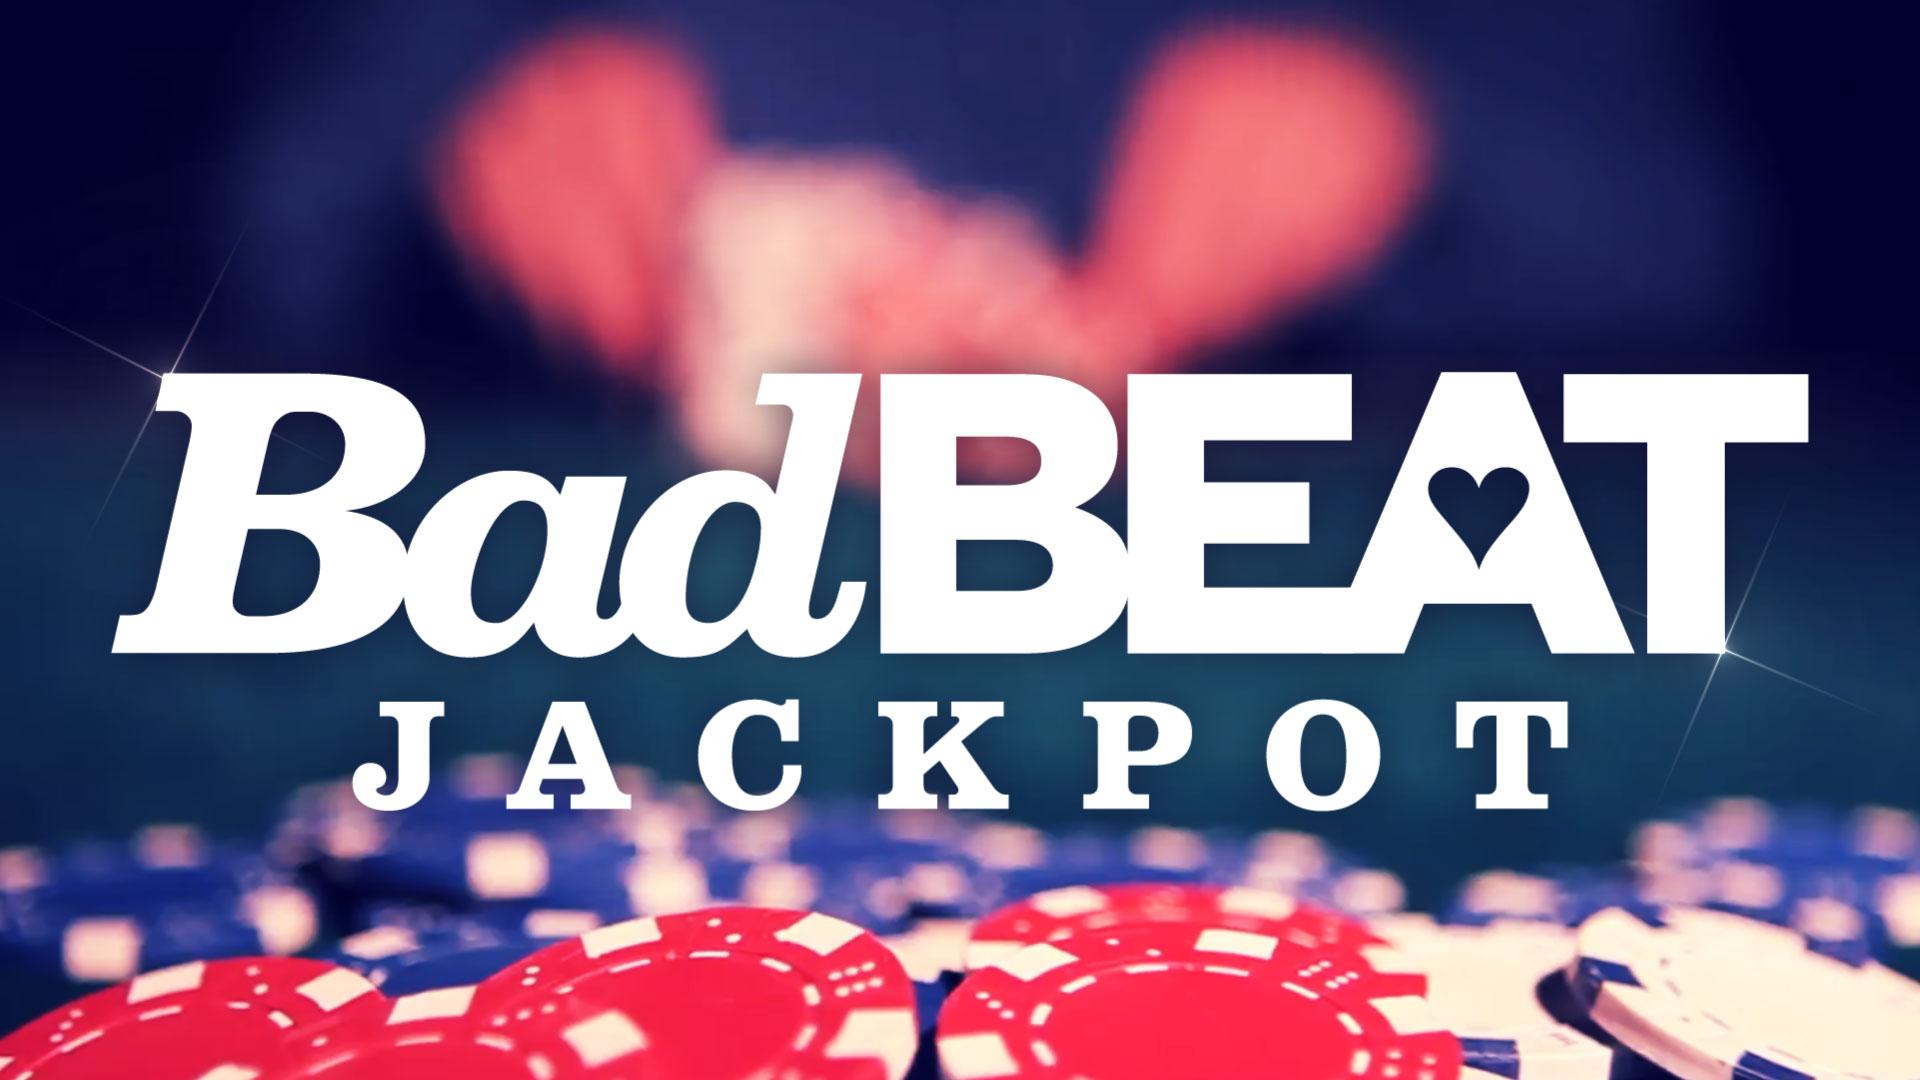 Boulevard casino poker bad beat